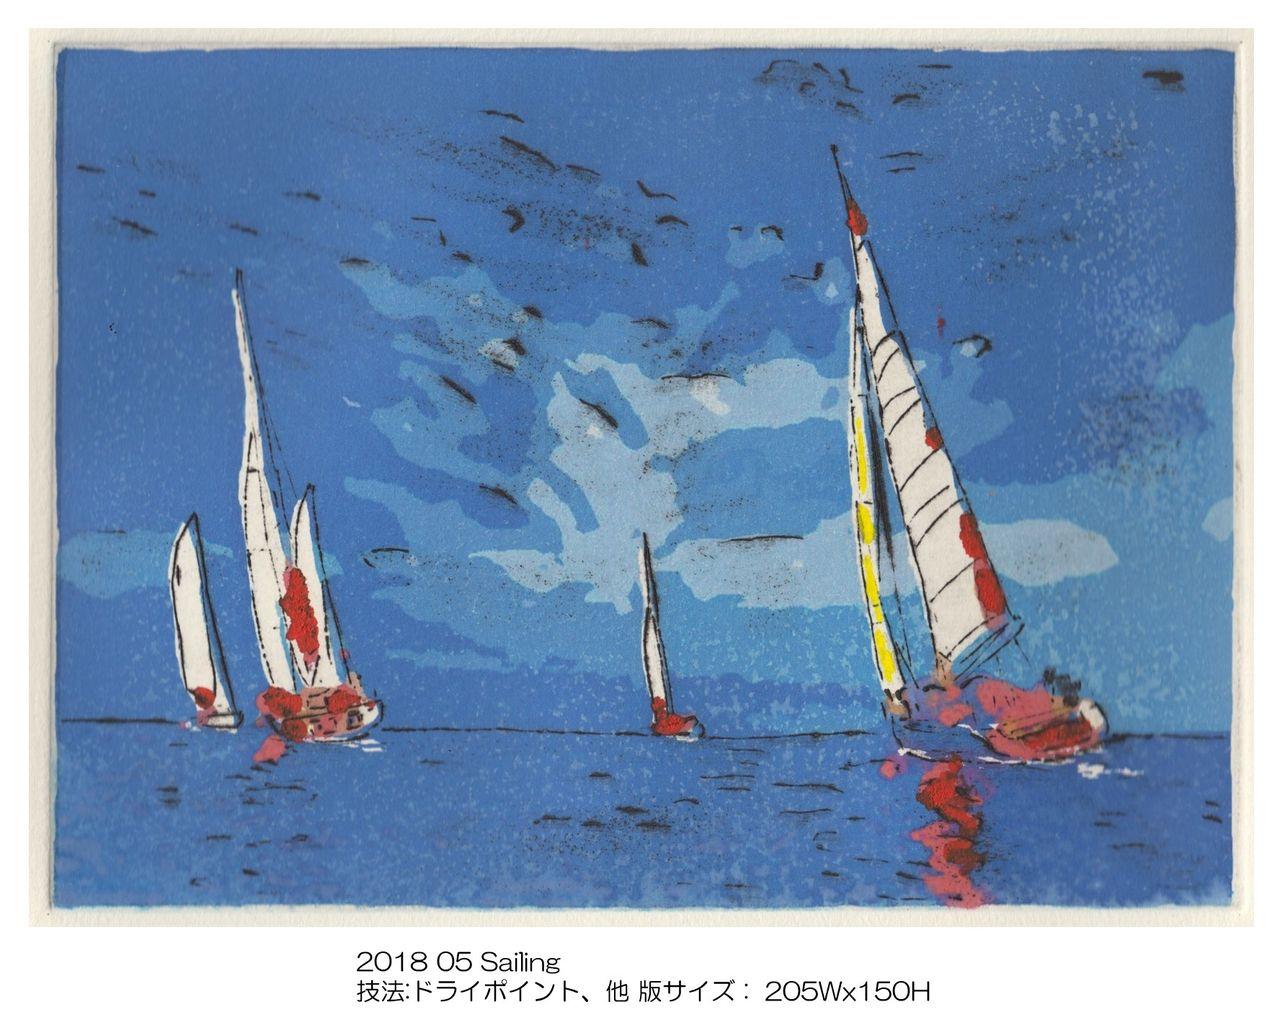 銅版画 Sailing 205Wx150H